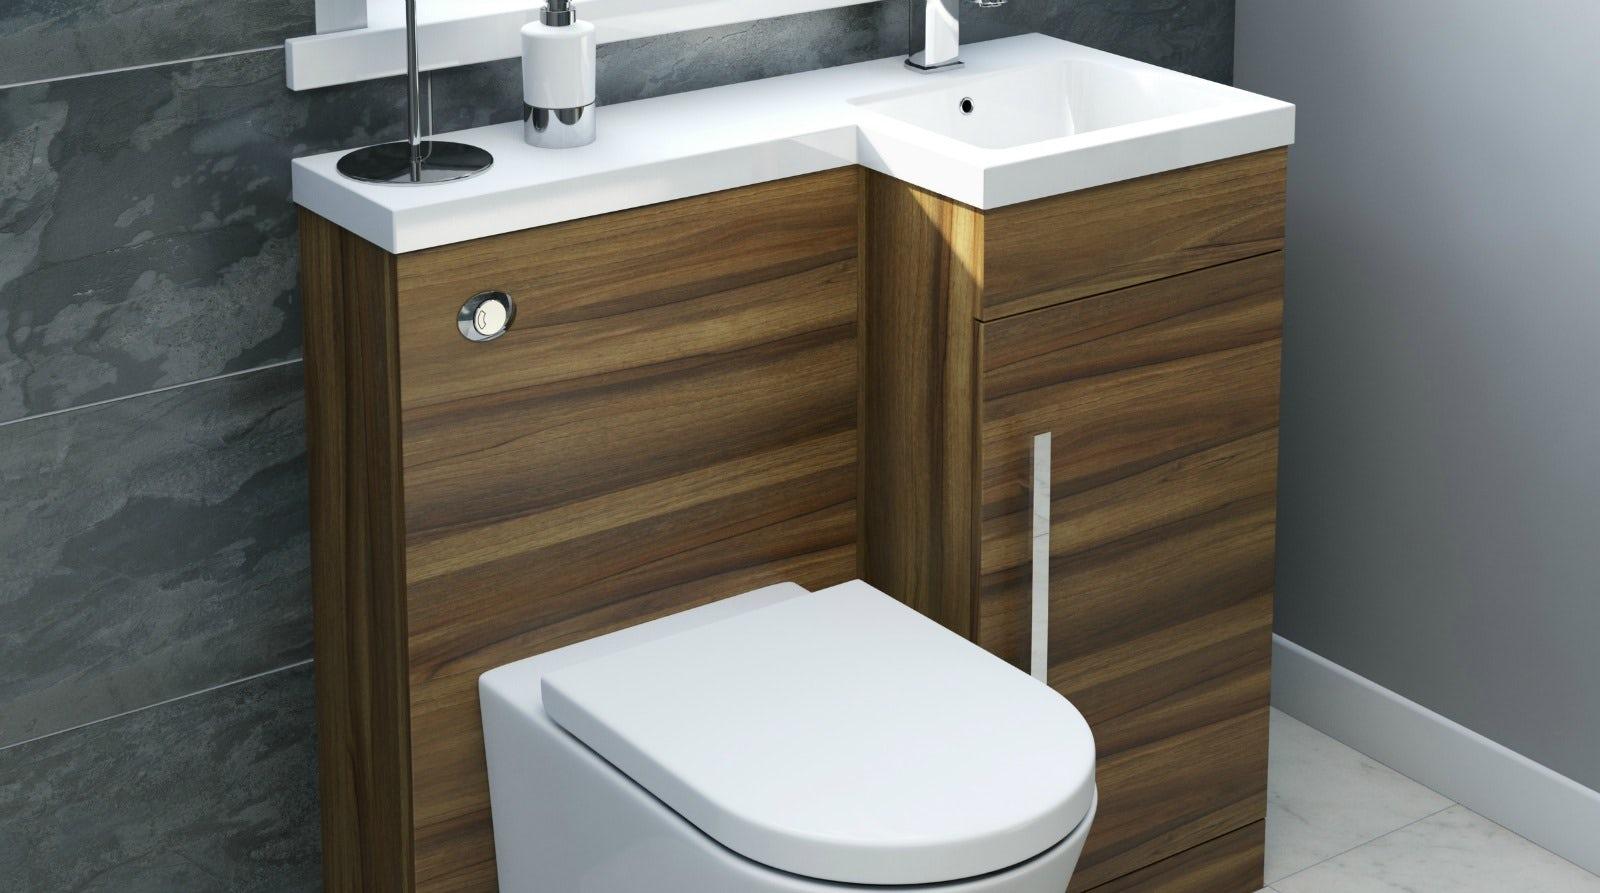 Images Bathroom Tiles. Bathroom Sink And Toilet Sets   Rukinet com